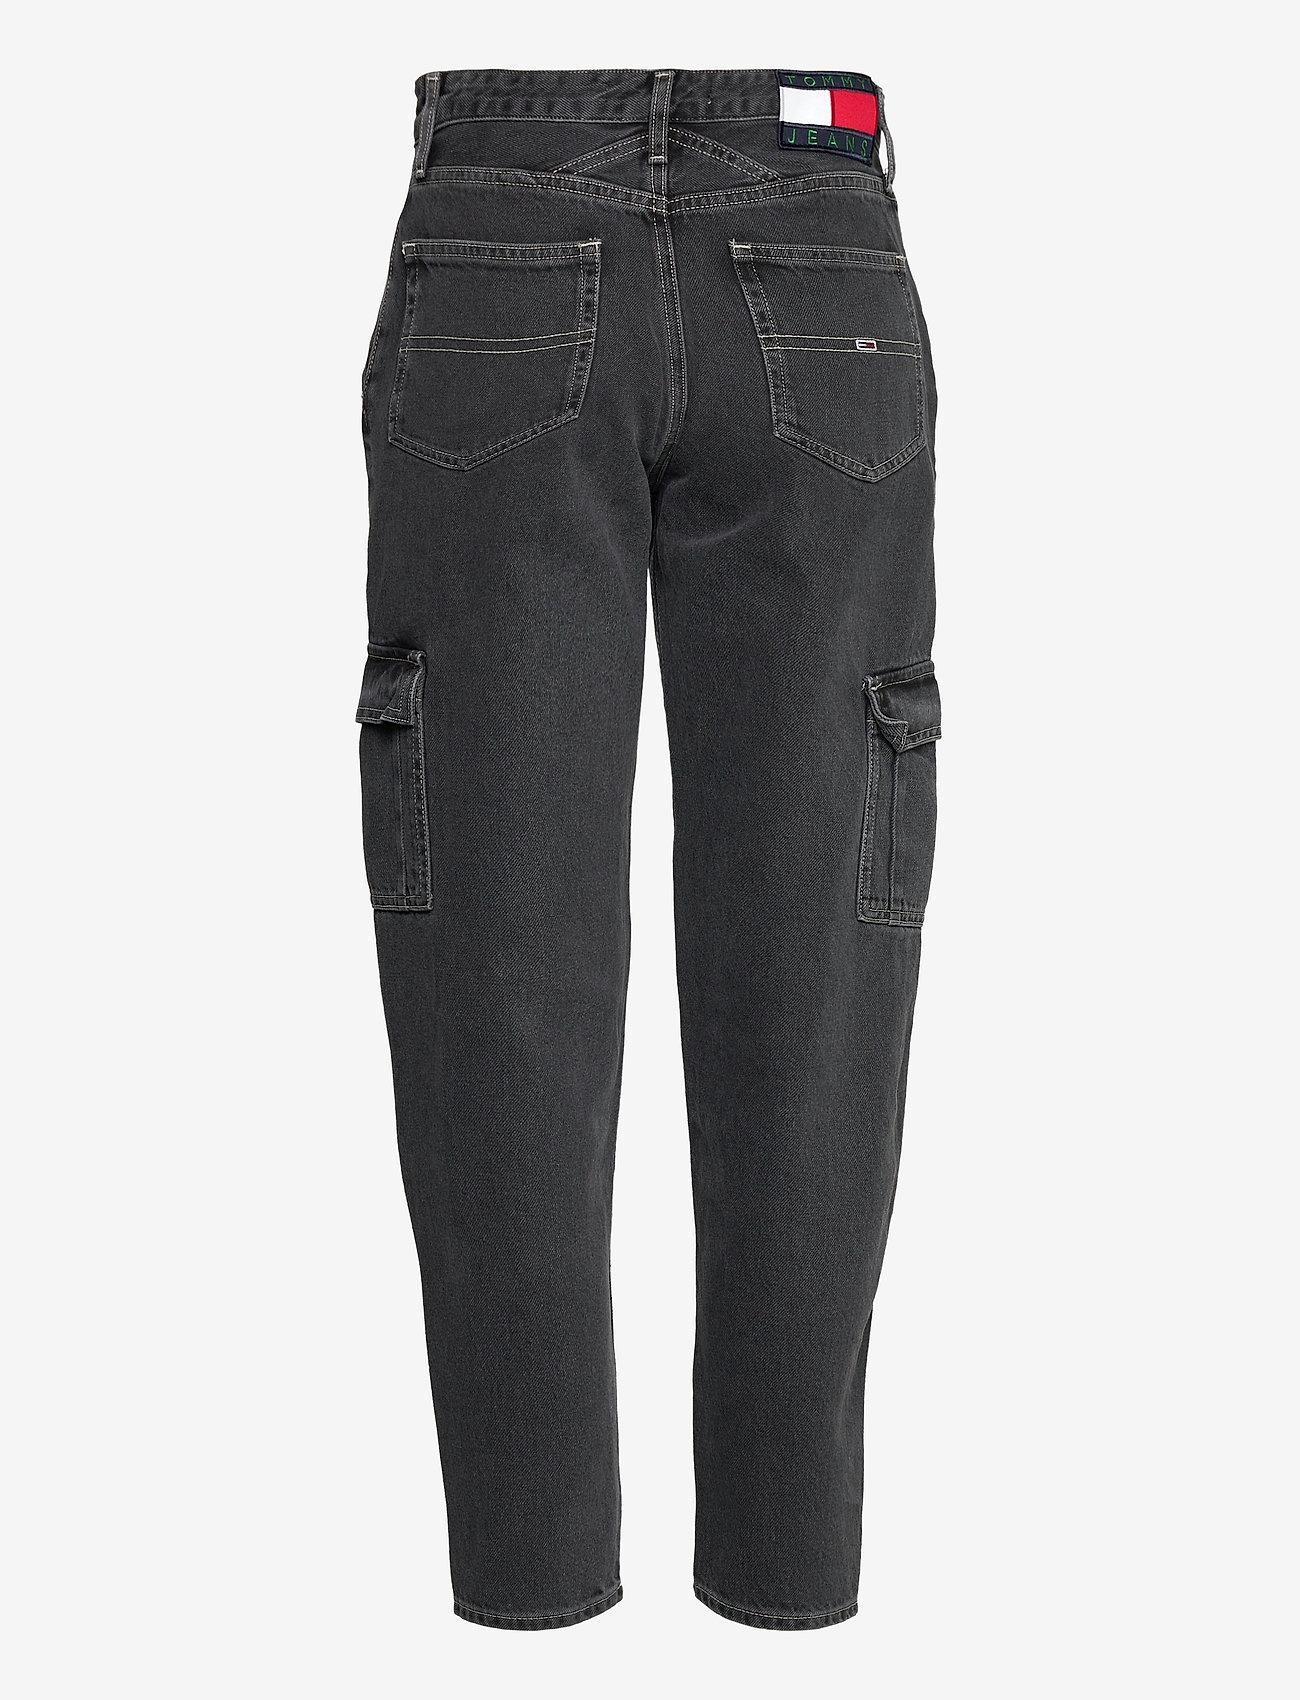 Tommy Jeans - MOM JEAN CARGO SVBKR - mom jeans - save ps bk rig - 1